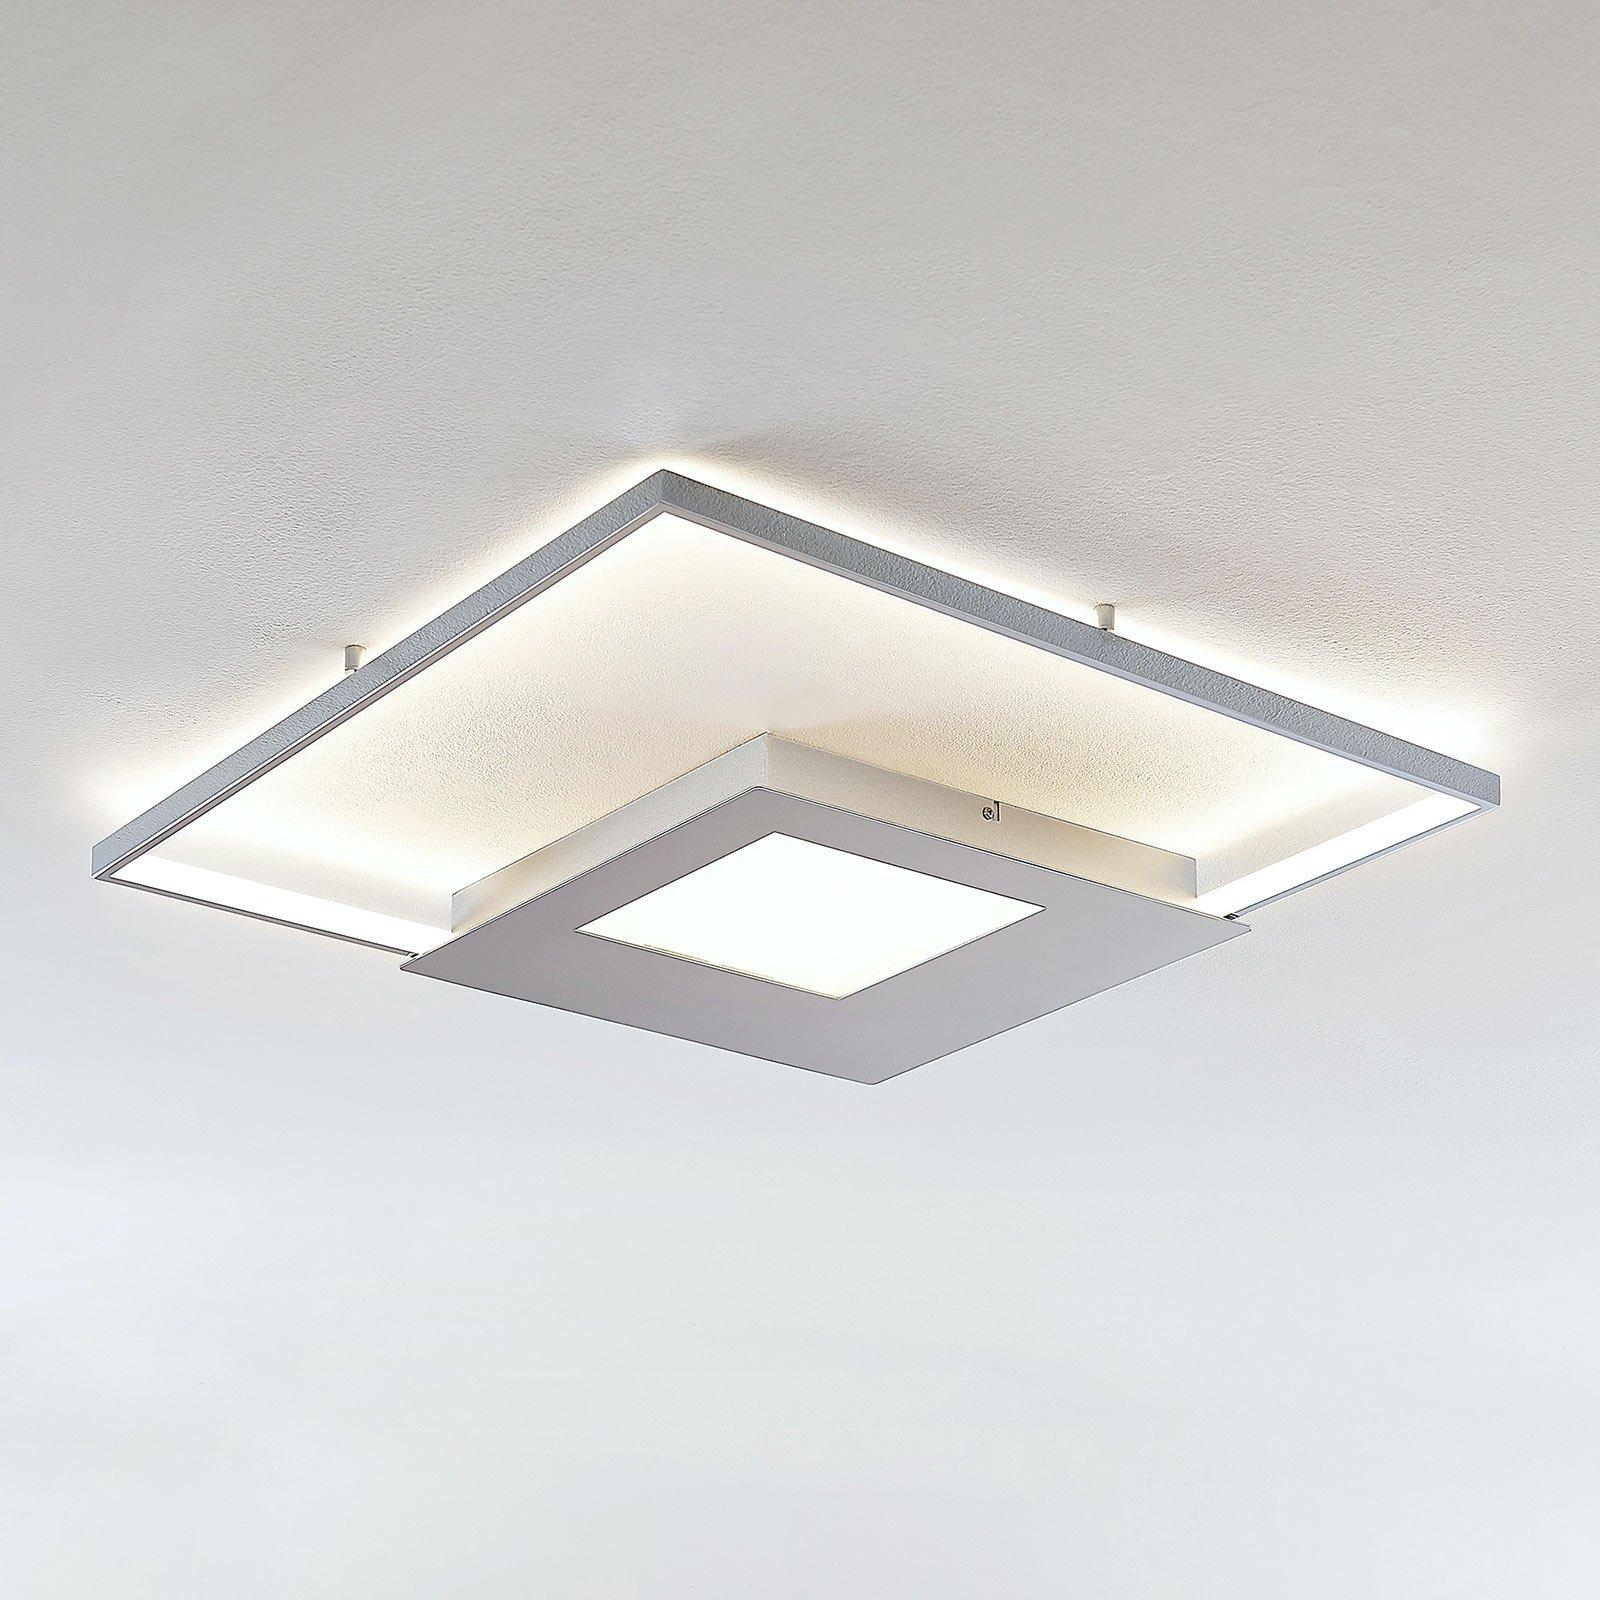 LED-taklampe Anays, kantet 62 cm